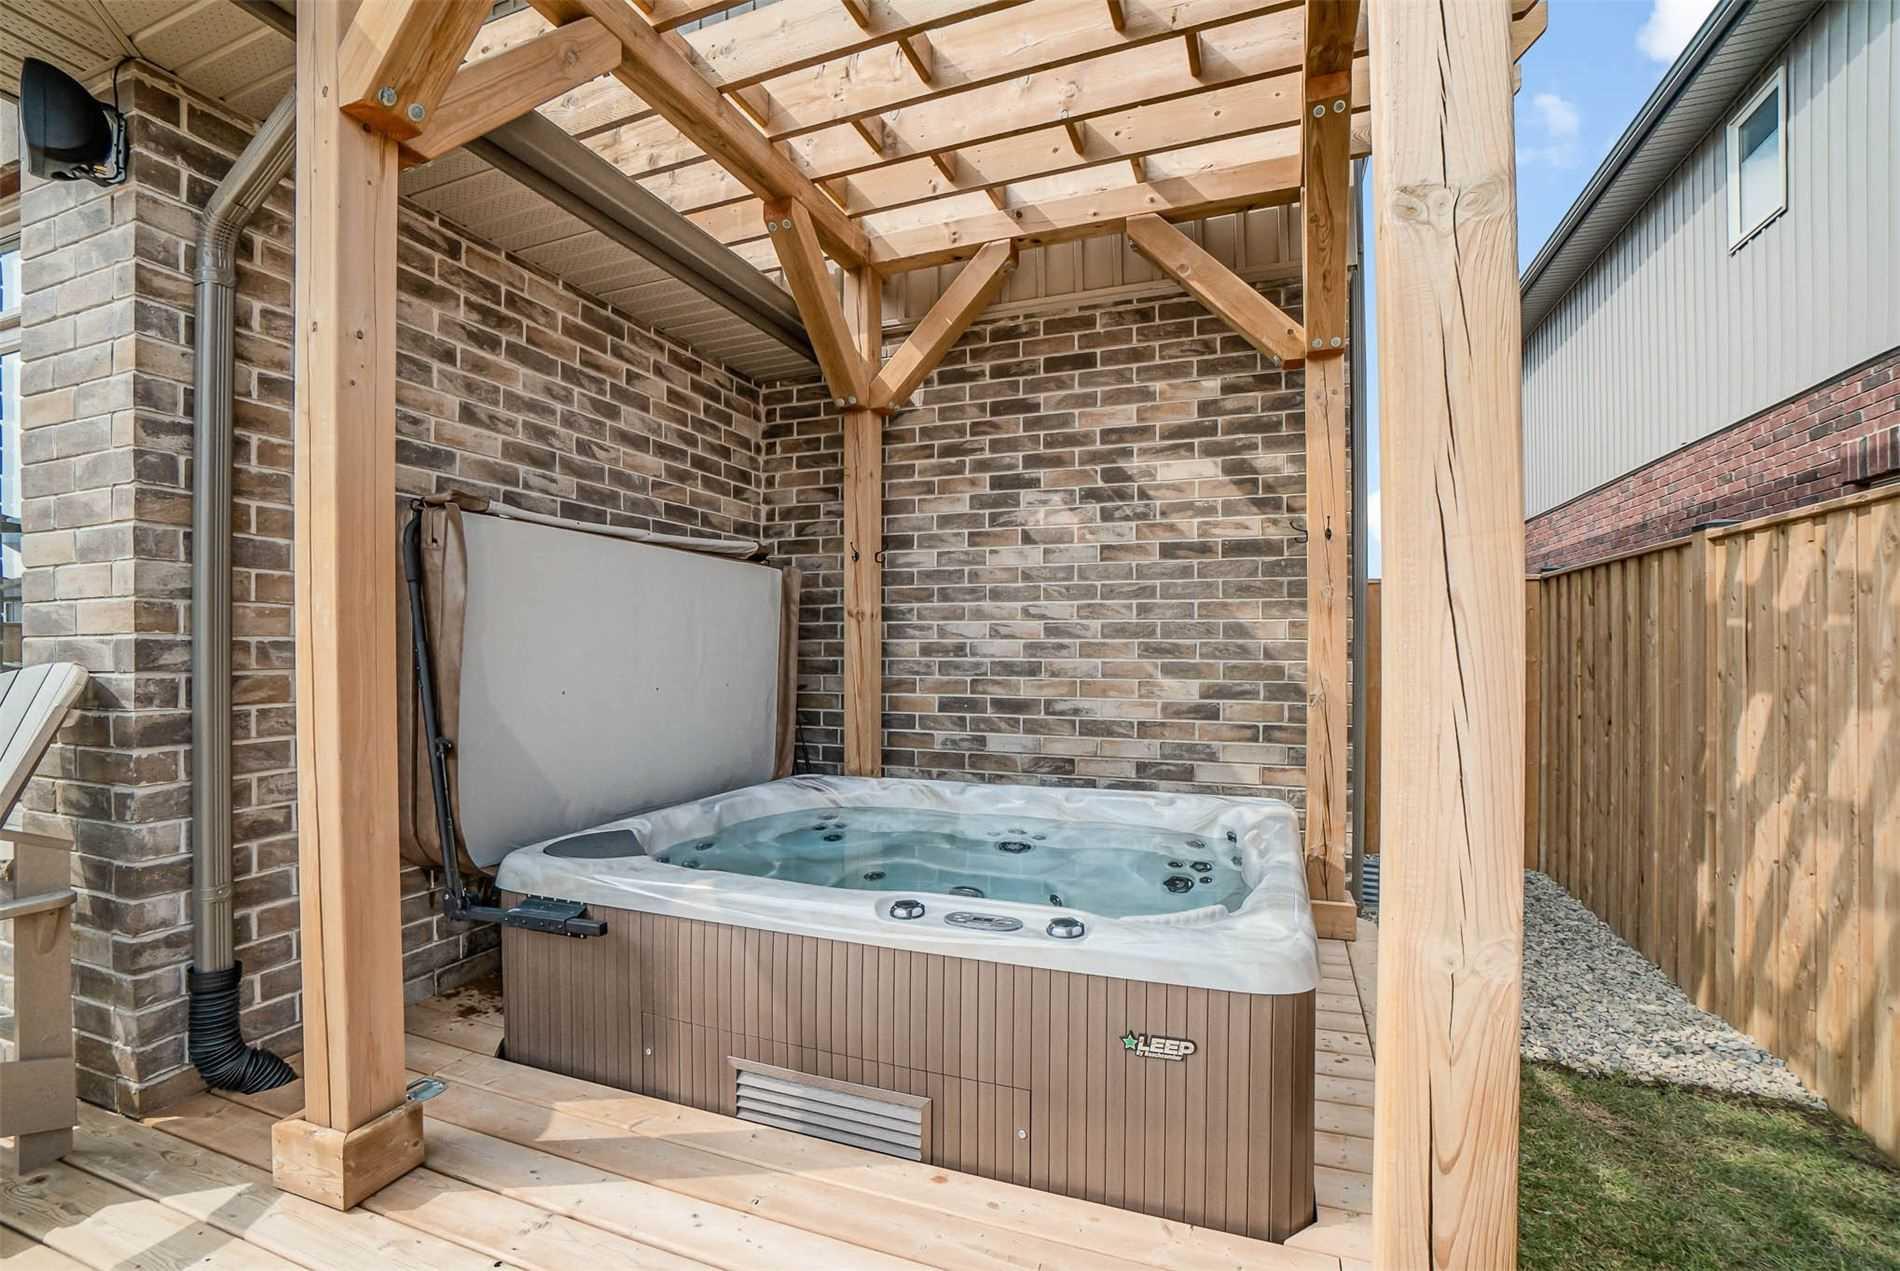 39 Orr St, Stratford, Ontario N5A 0H7, 4 Bedrooms Bedrooms, ,3 BathroomsBathrooms,Detached,For Sale,Orr,X5167853